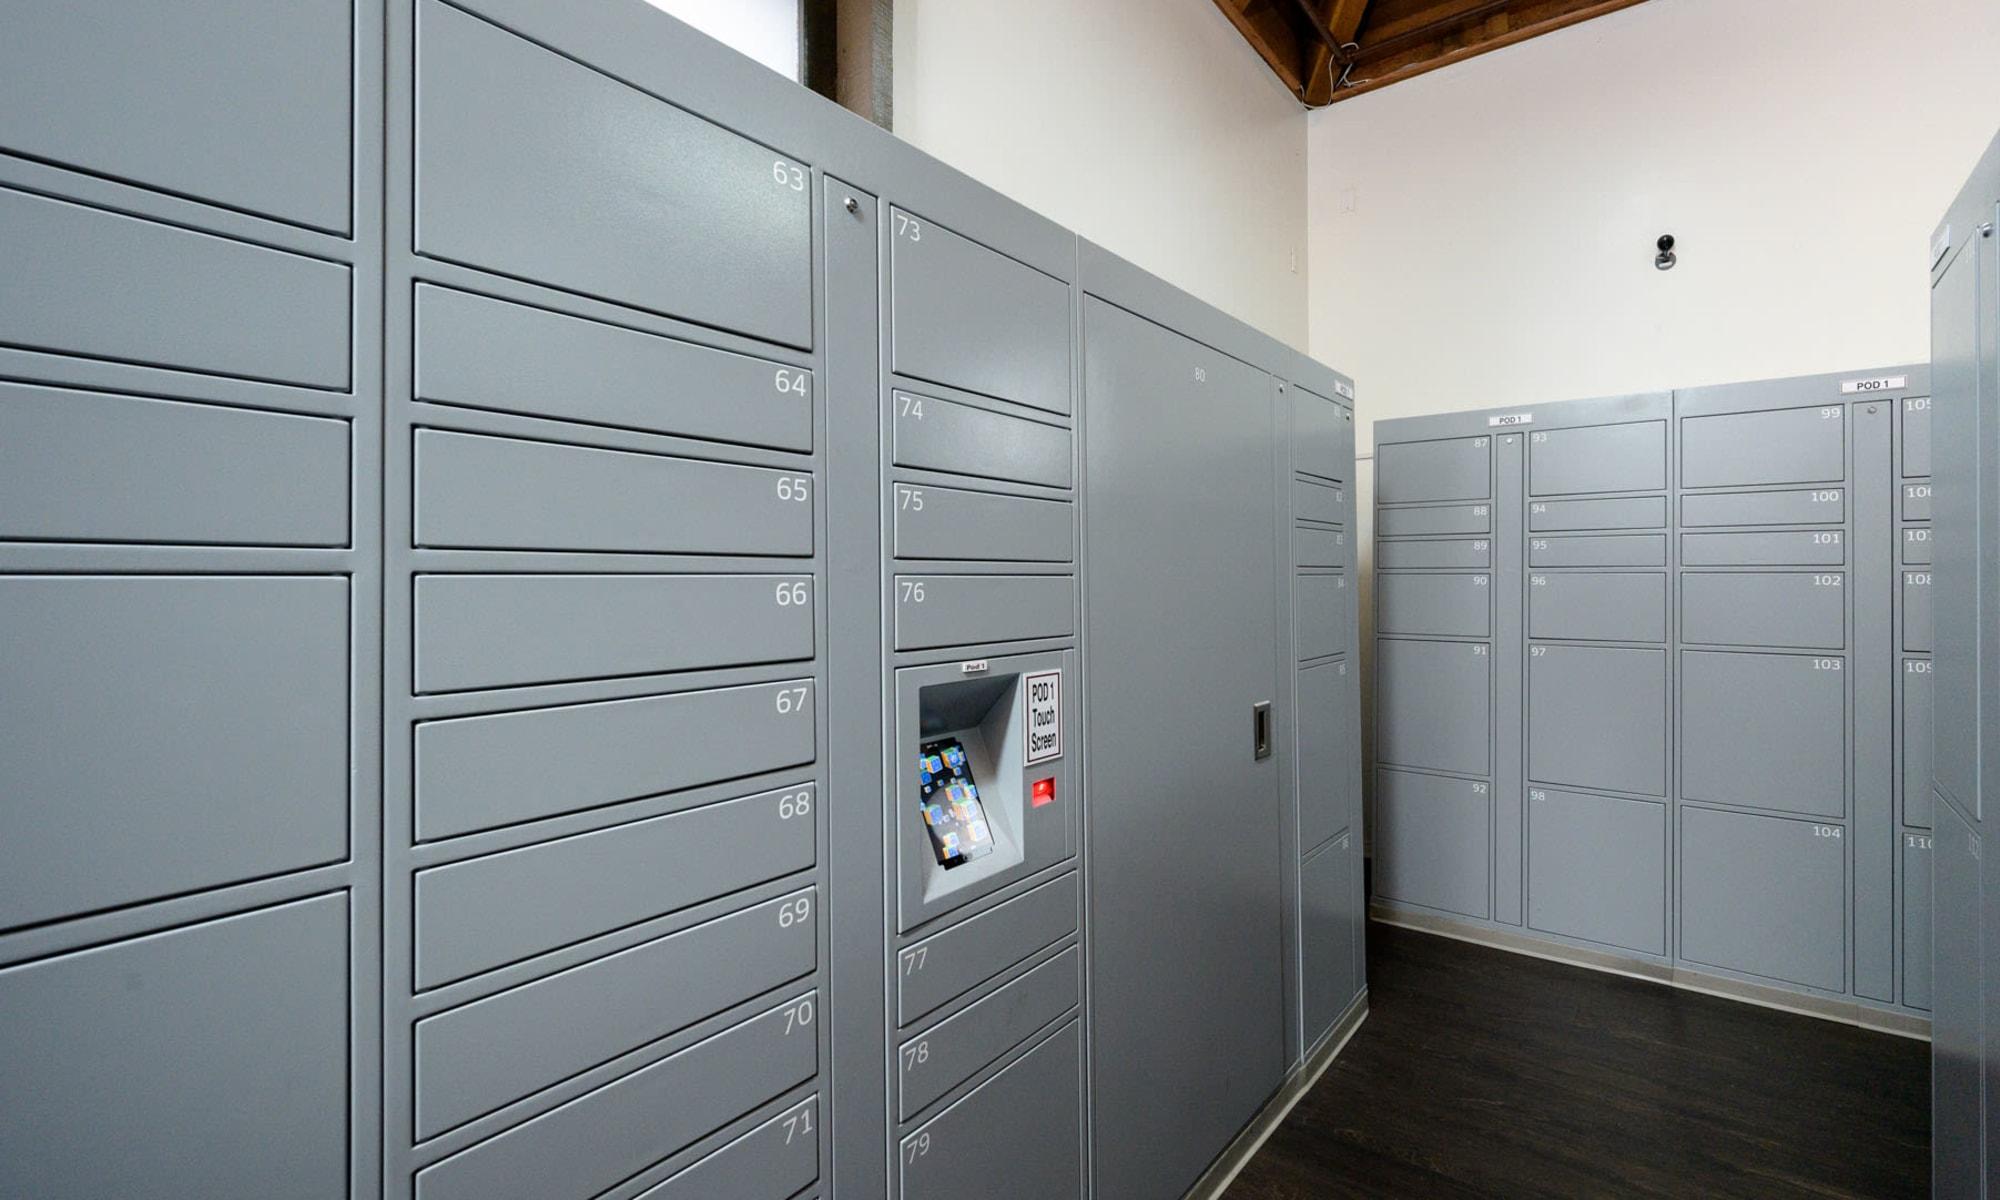 Package lockers at Mariners Village in Marina del Rey, California